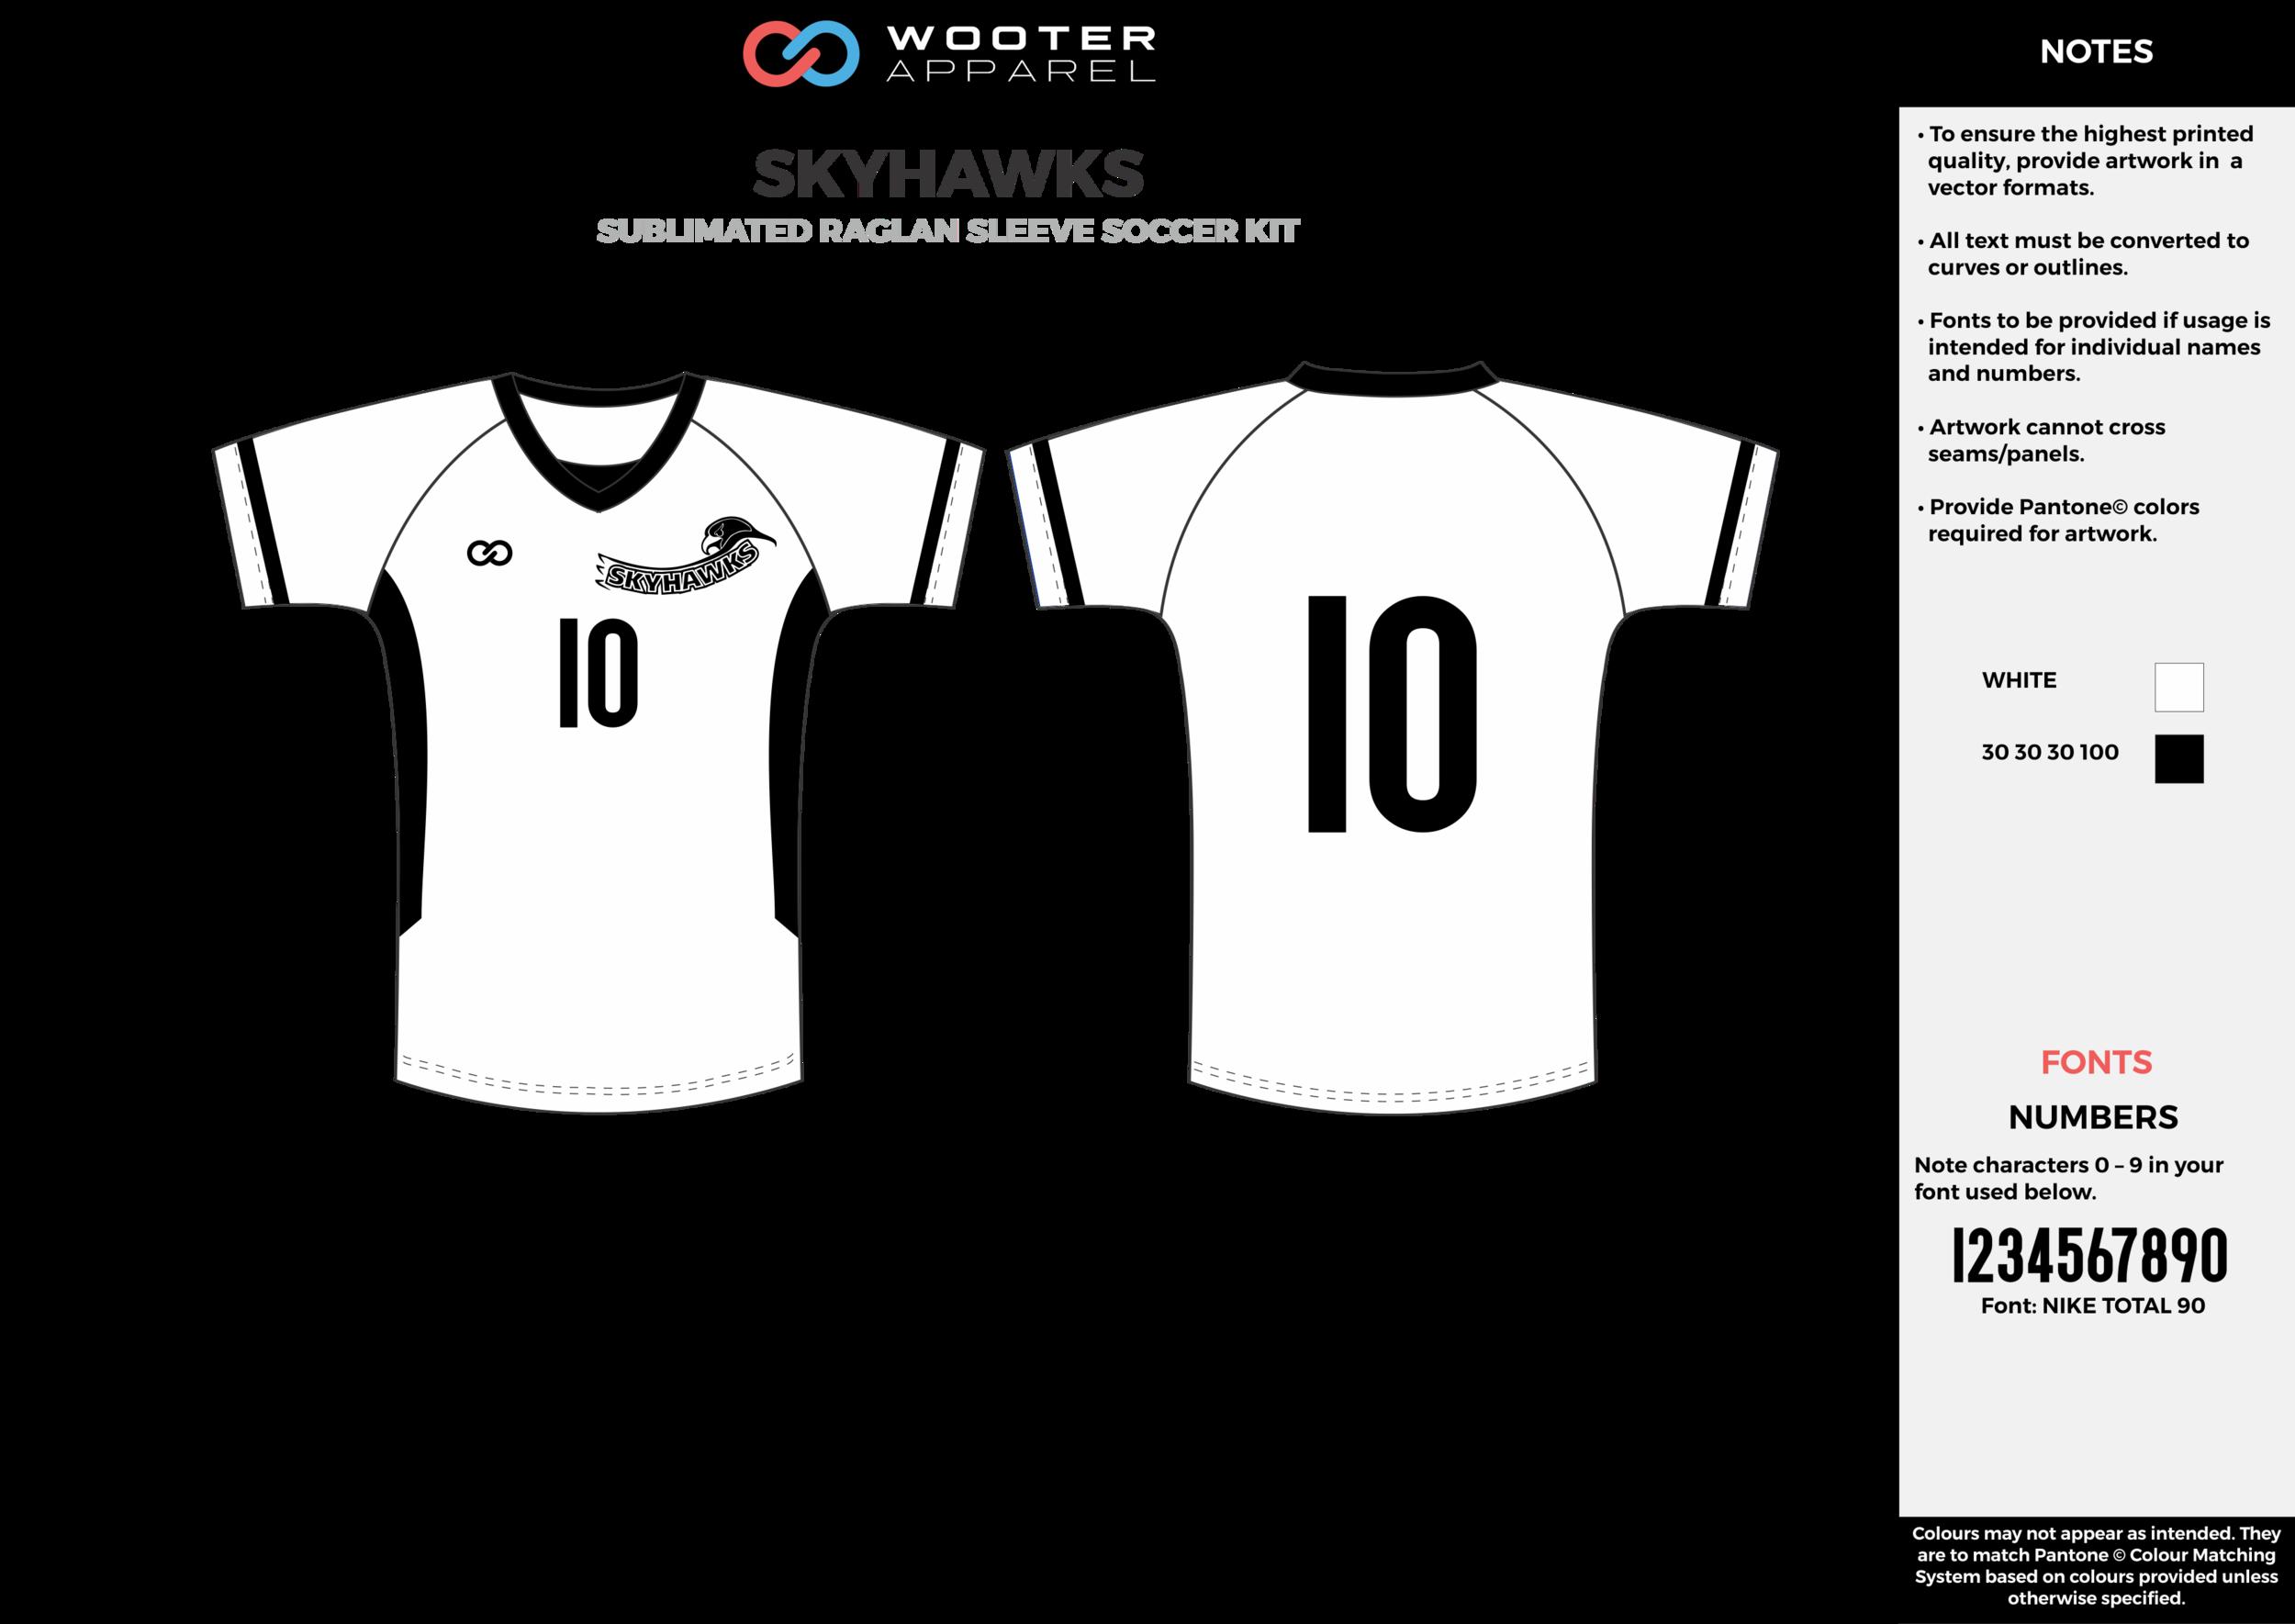 SKYHAWKS white black custom sublimated soccer uniform jersey shirt